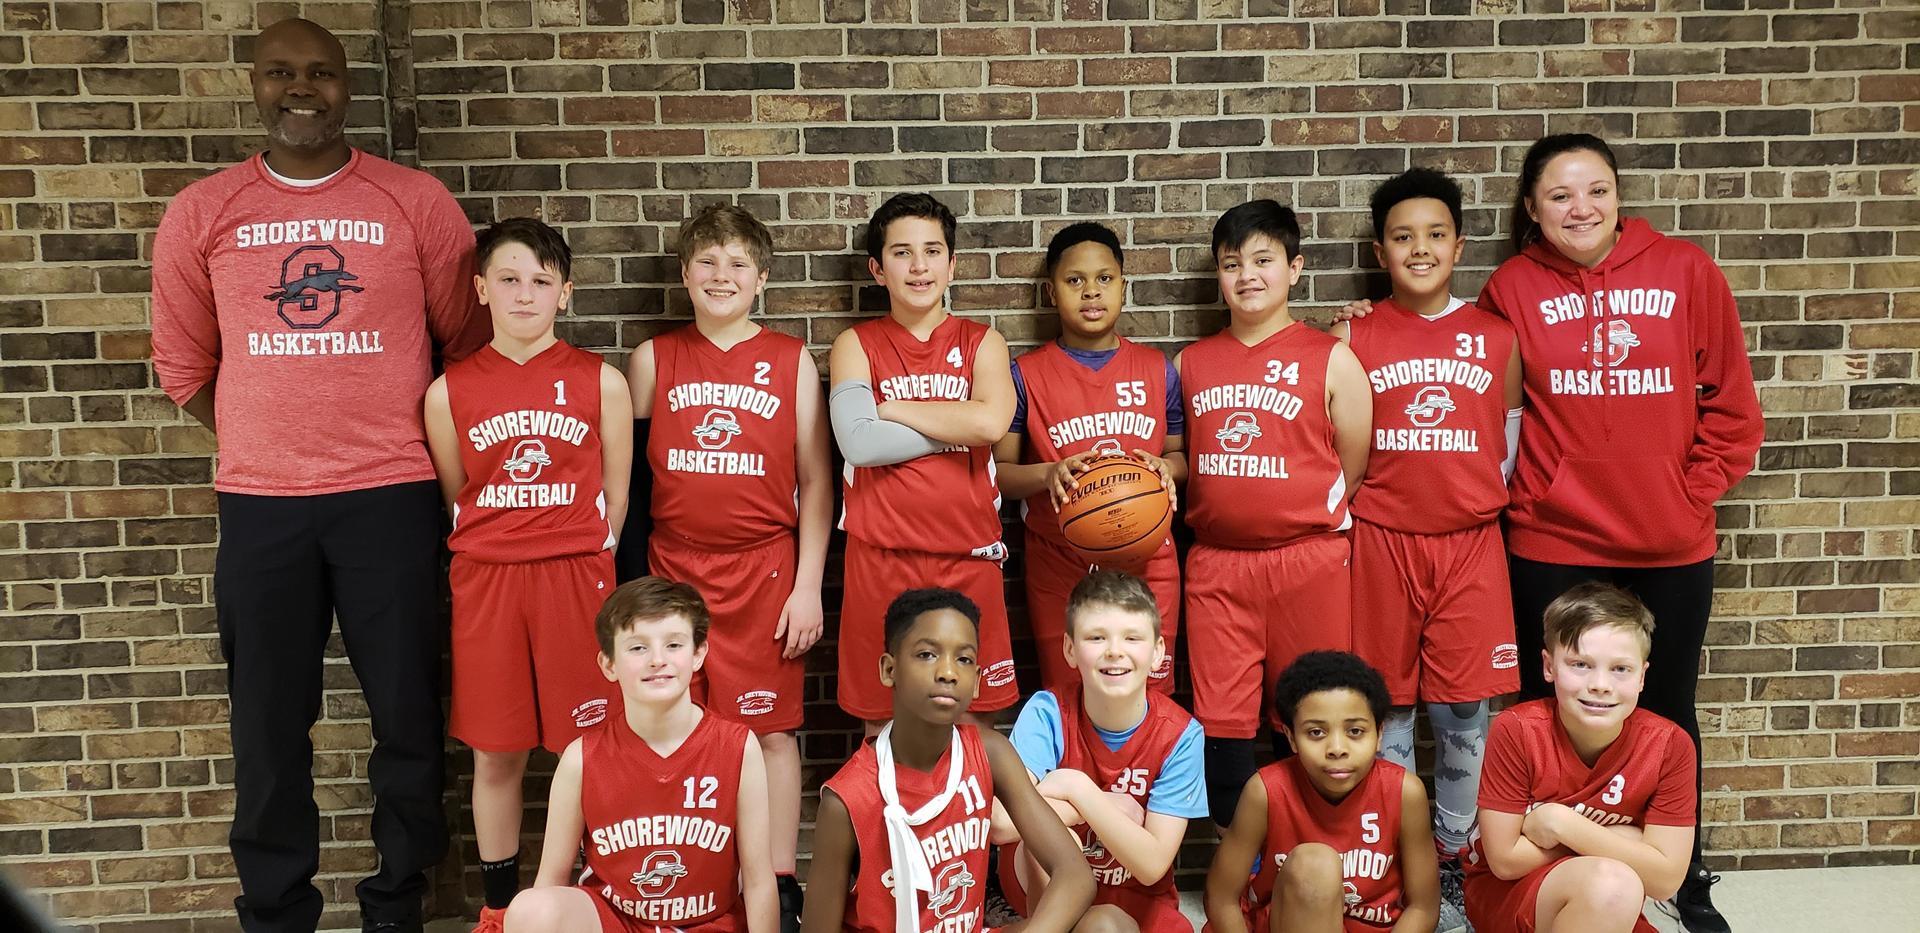 Jr. Greyhound 5th grade team photo